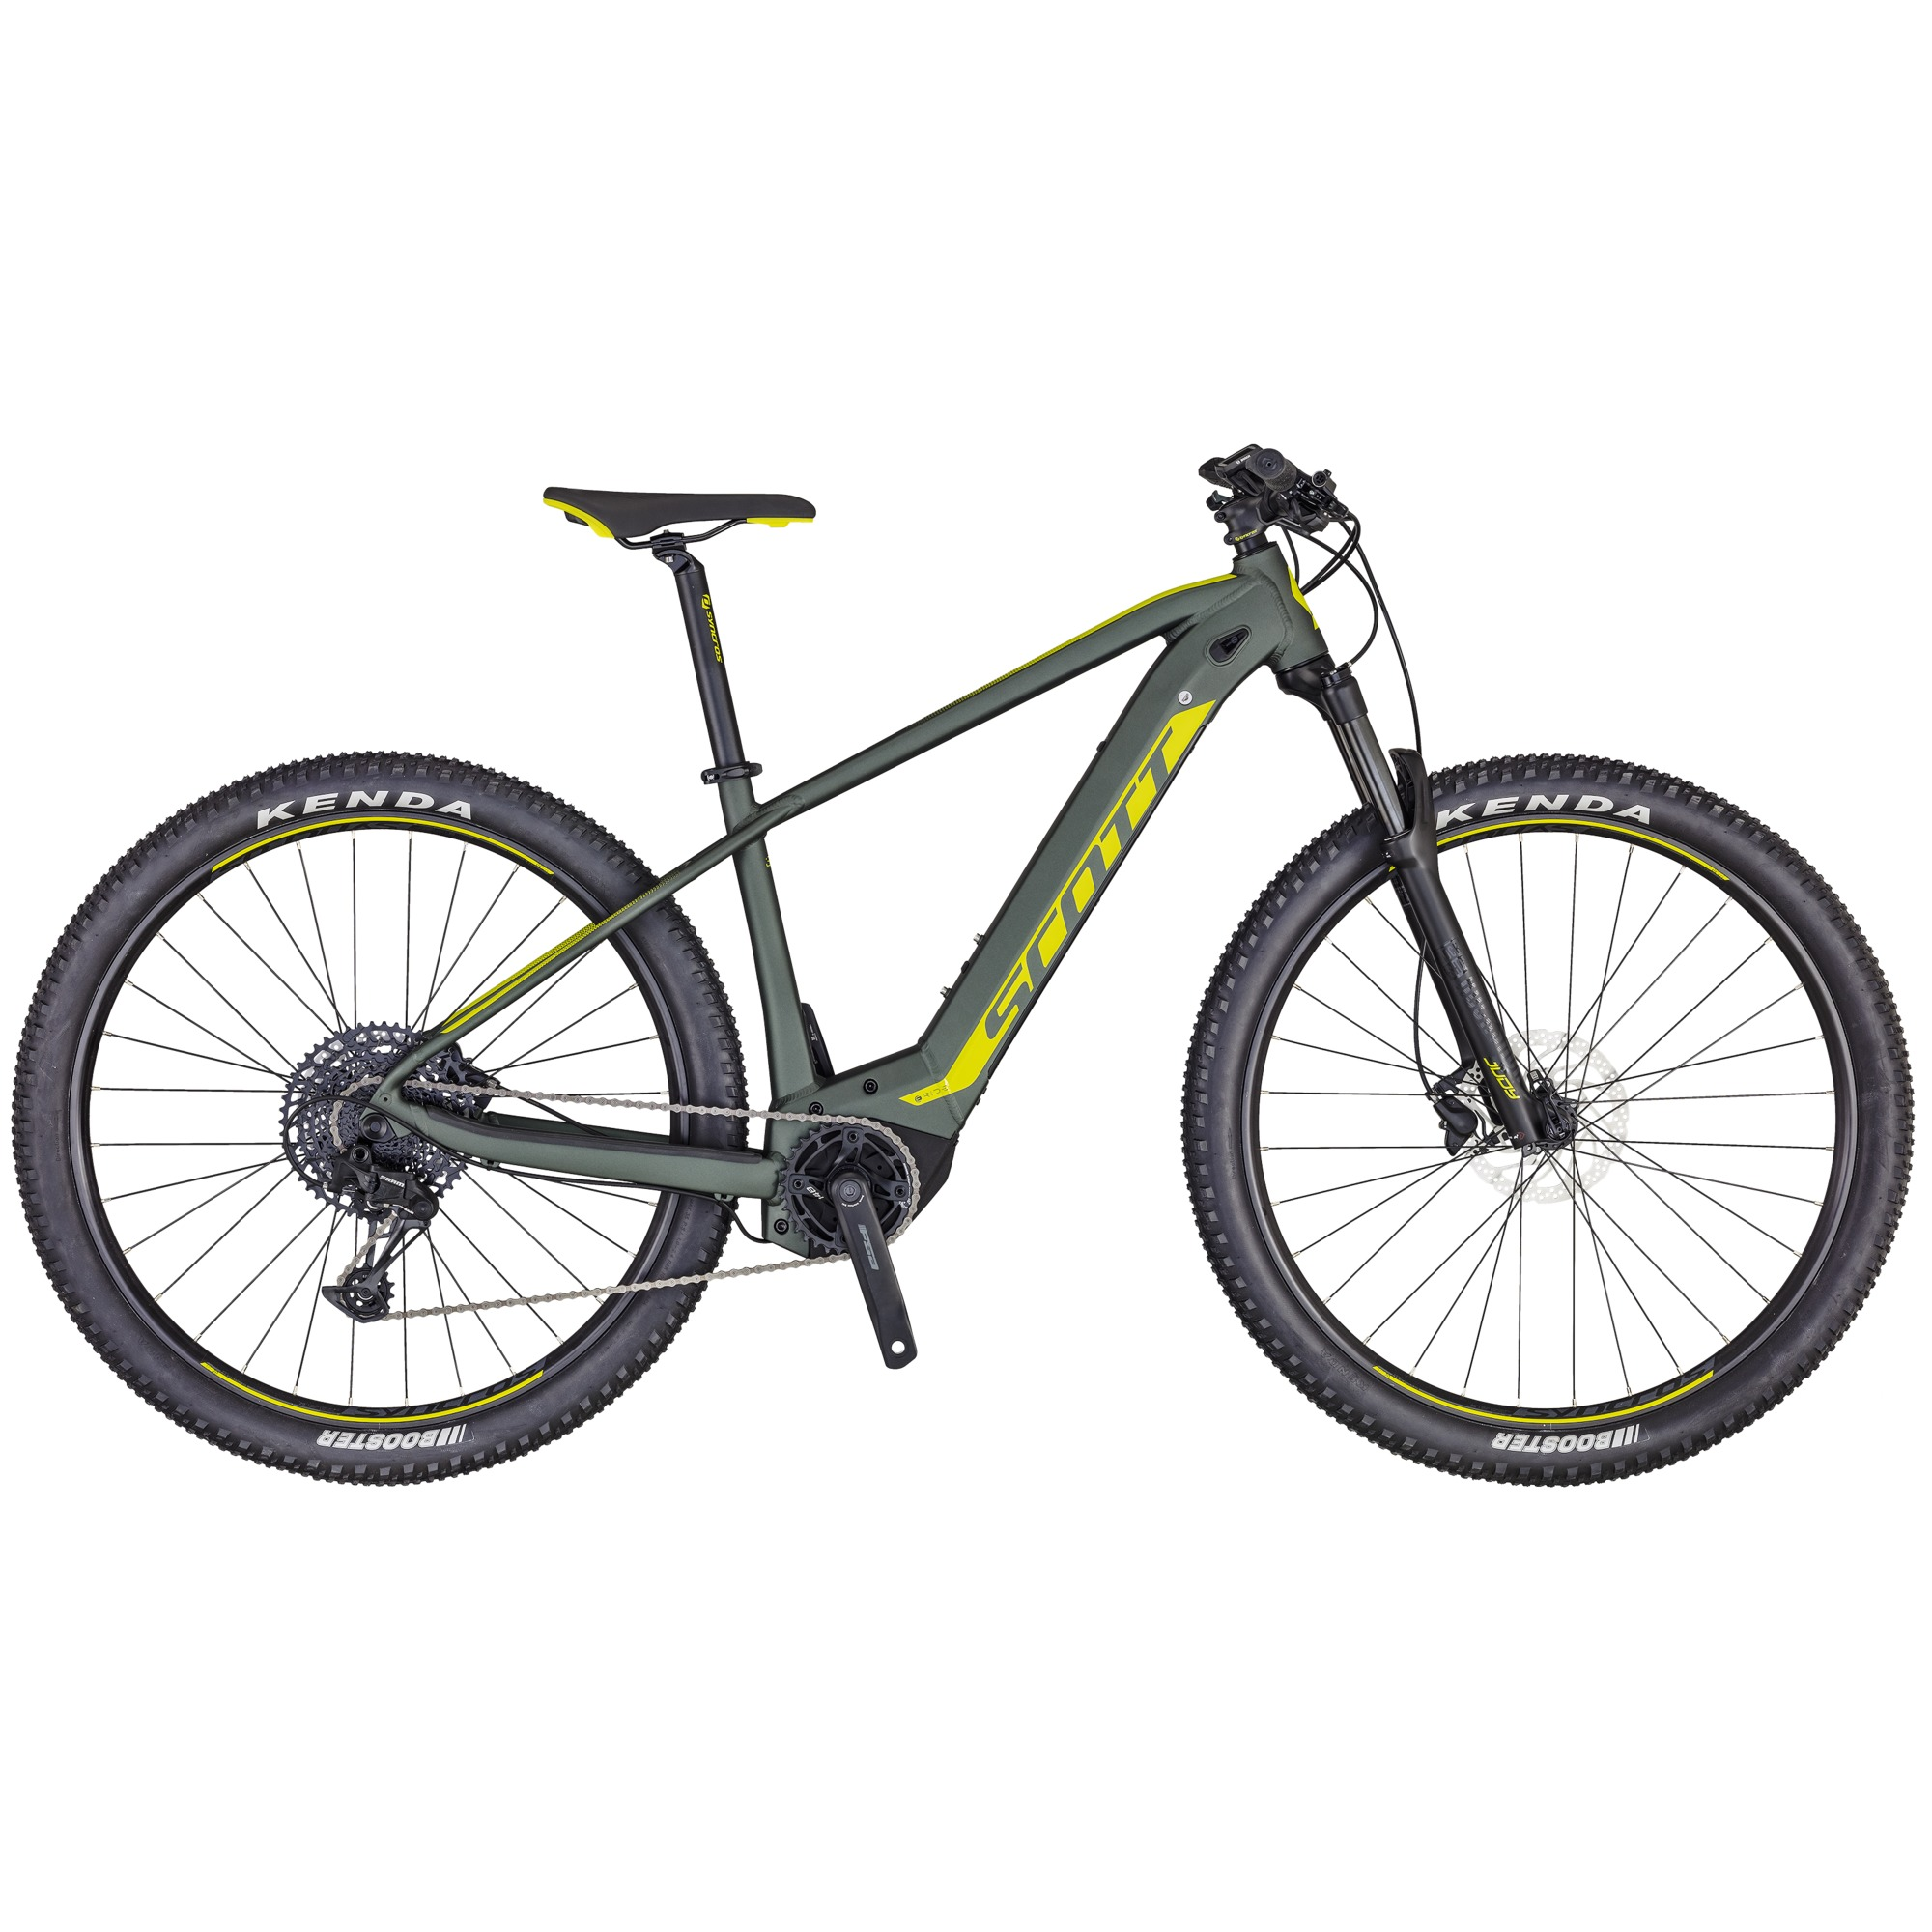 Vélo Scott Aspect eRide 930 2020